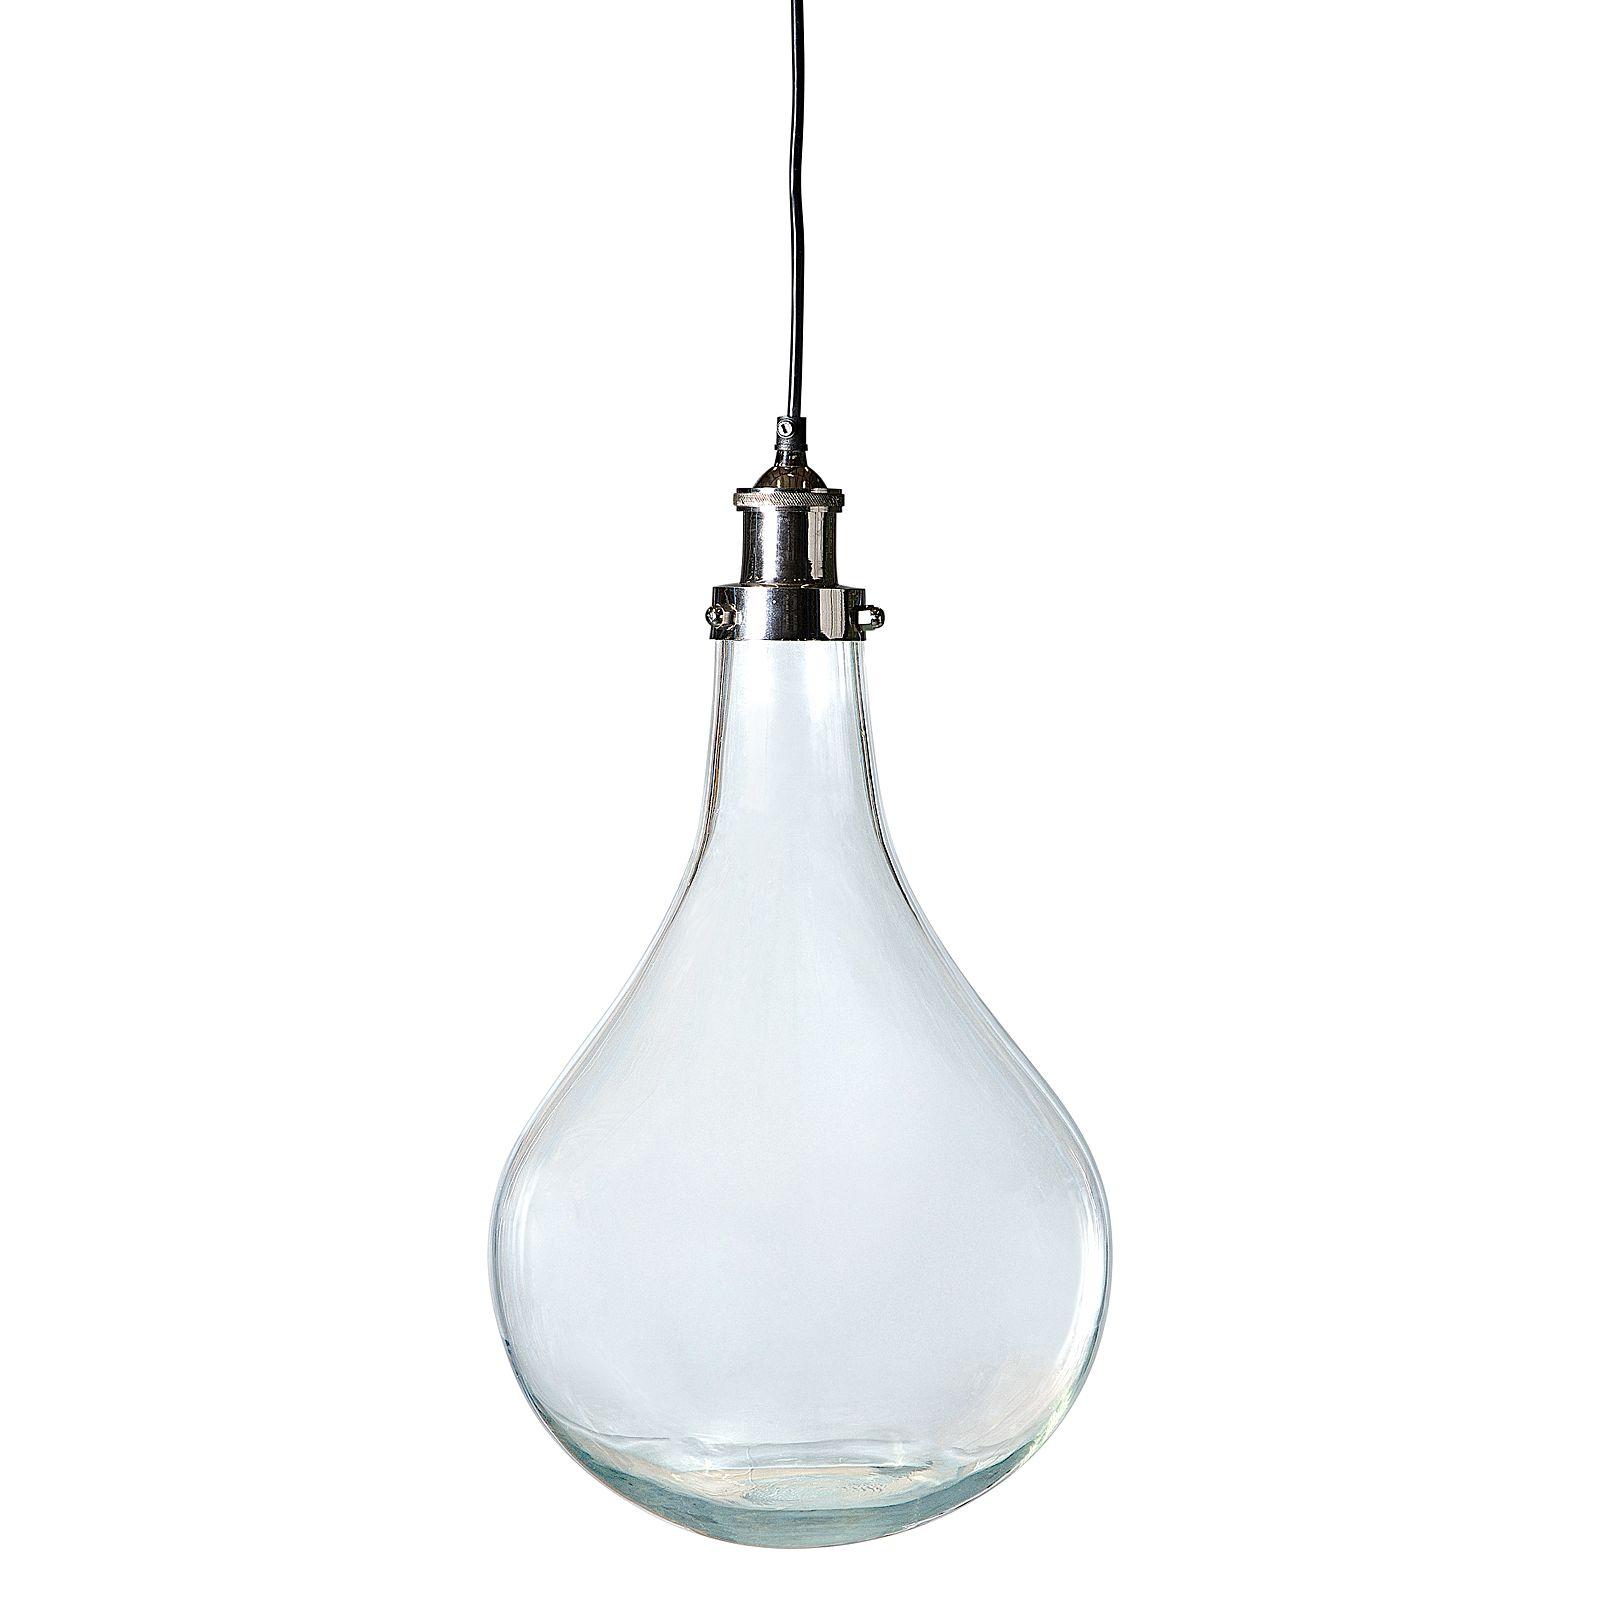 Odean Glass Pendant Light Regarding Well Liked Demi 1 Light Globe Pendants (View 25 of 25)